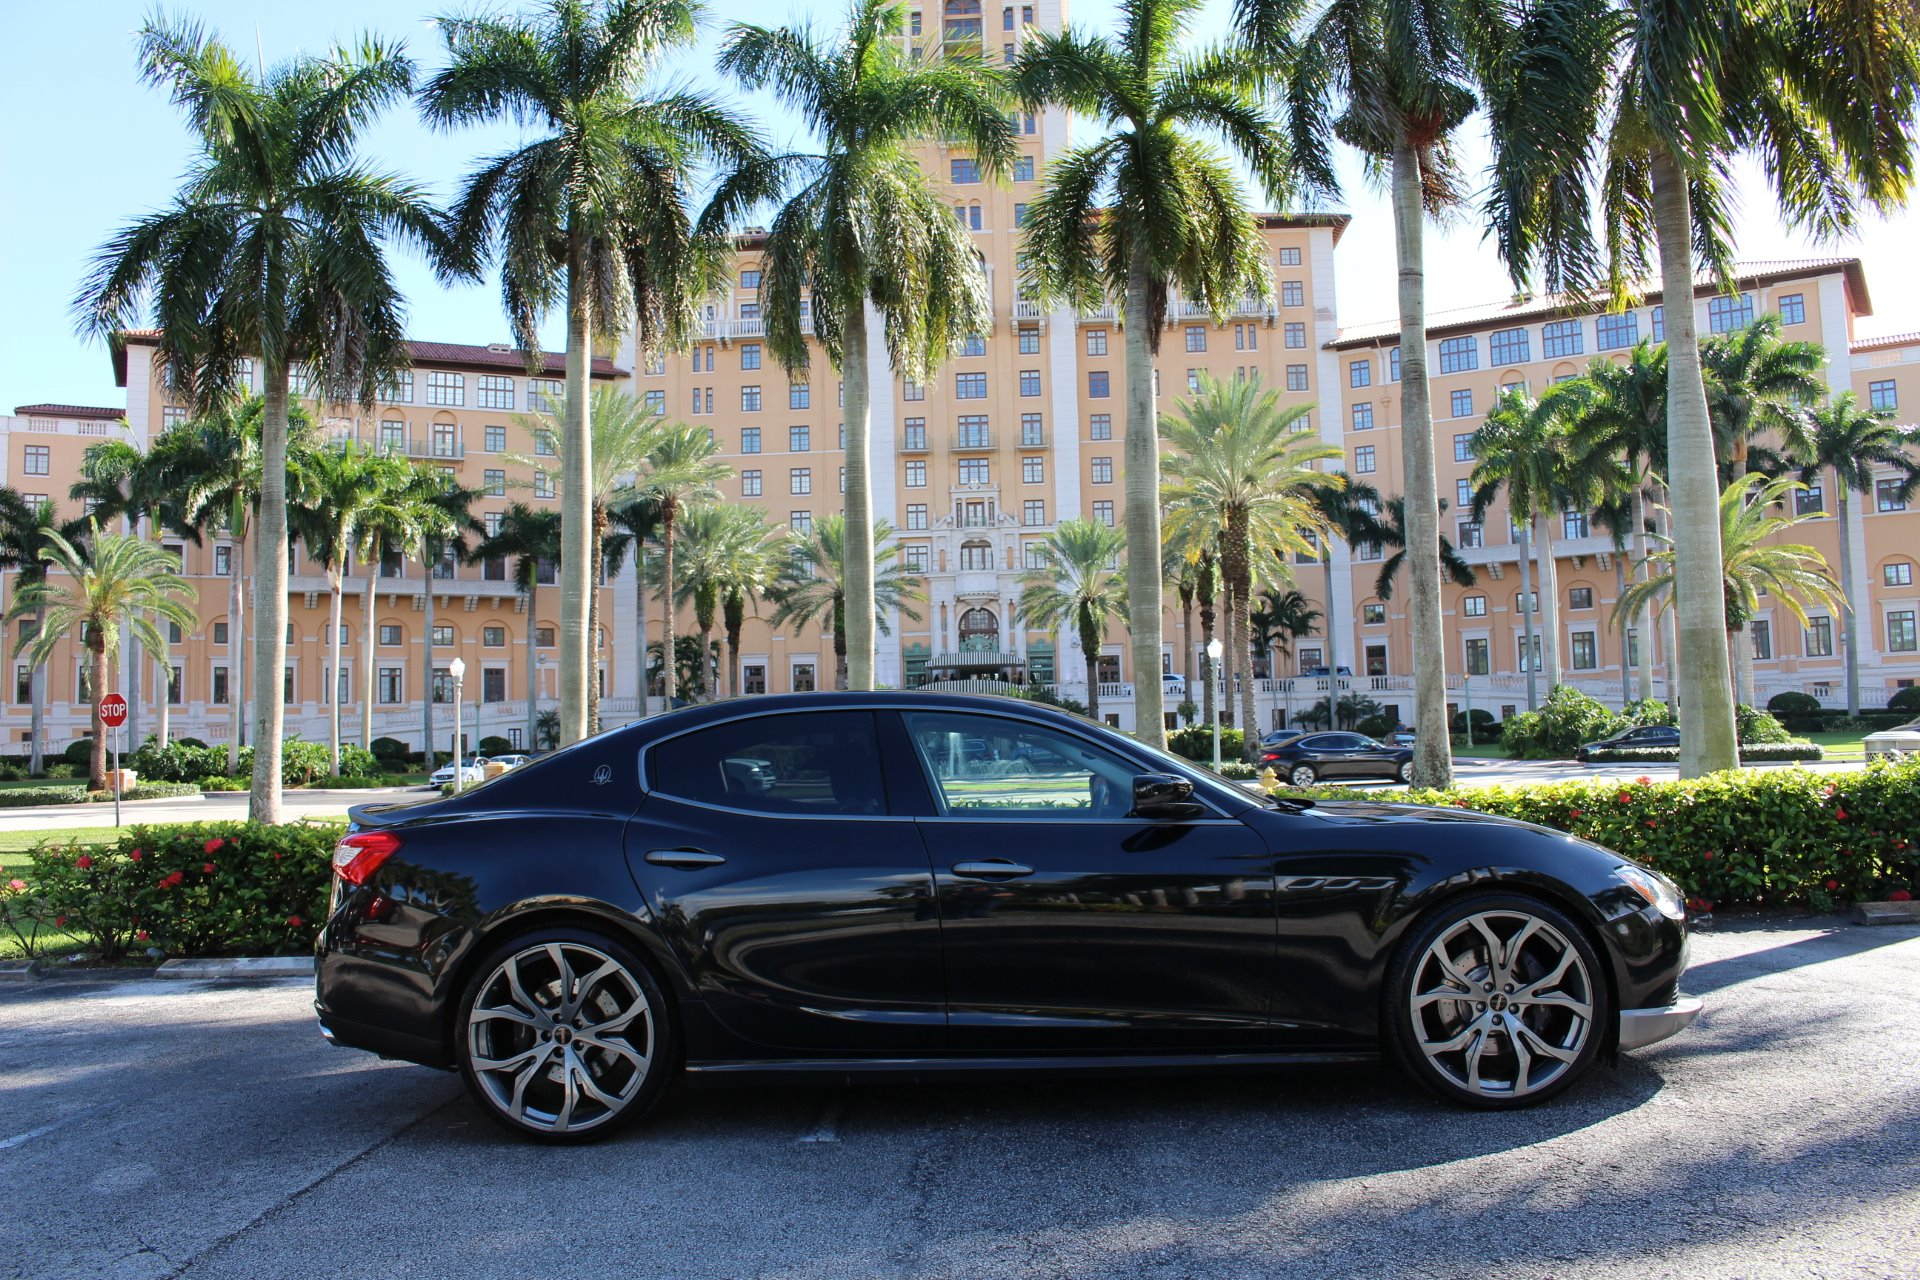 Used 2015 Maserati Ghibli SQ4 Novitec for sale Sold at The Gables Sports Cars in Miami FL 33146 2